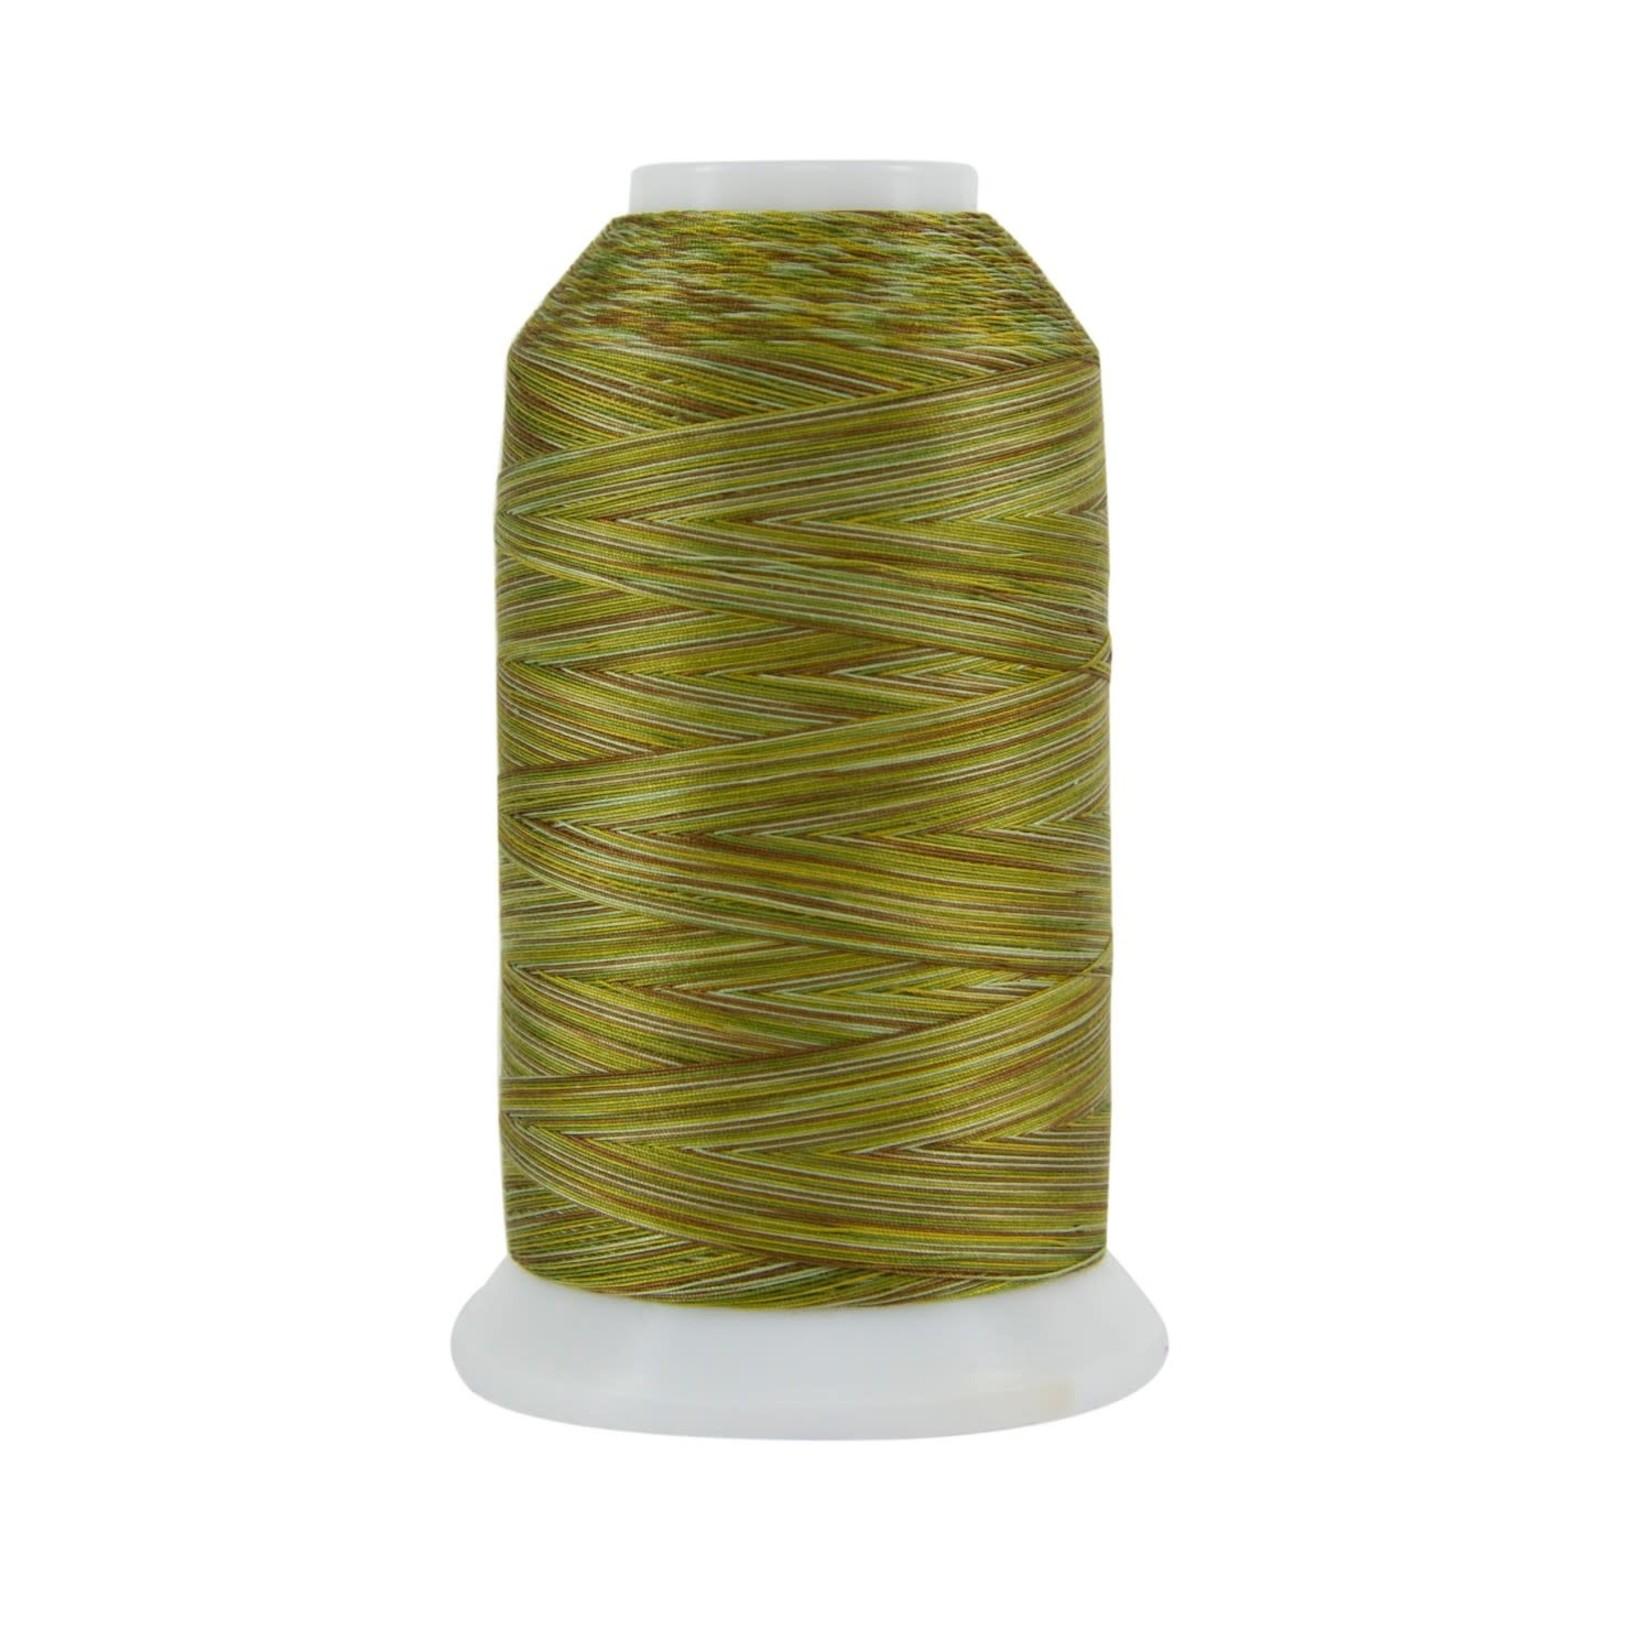 Superior Threads King Tut - #40 - 1828 m - 0910 Bulrushes